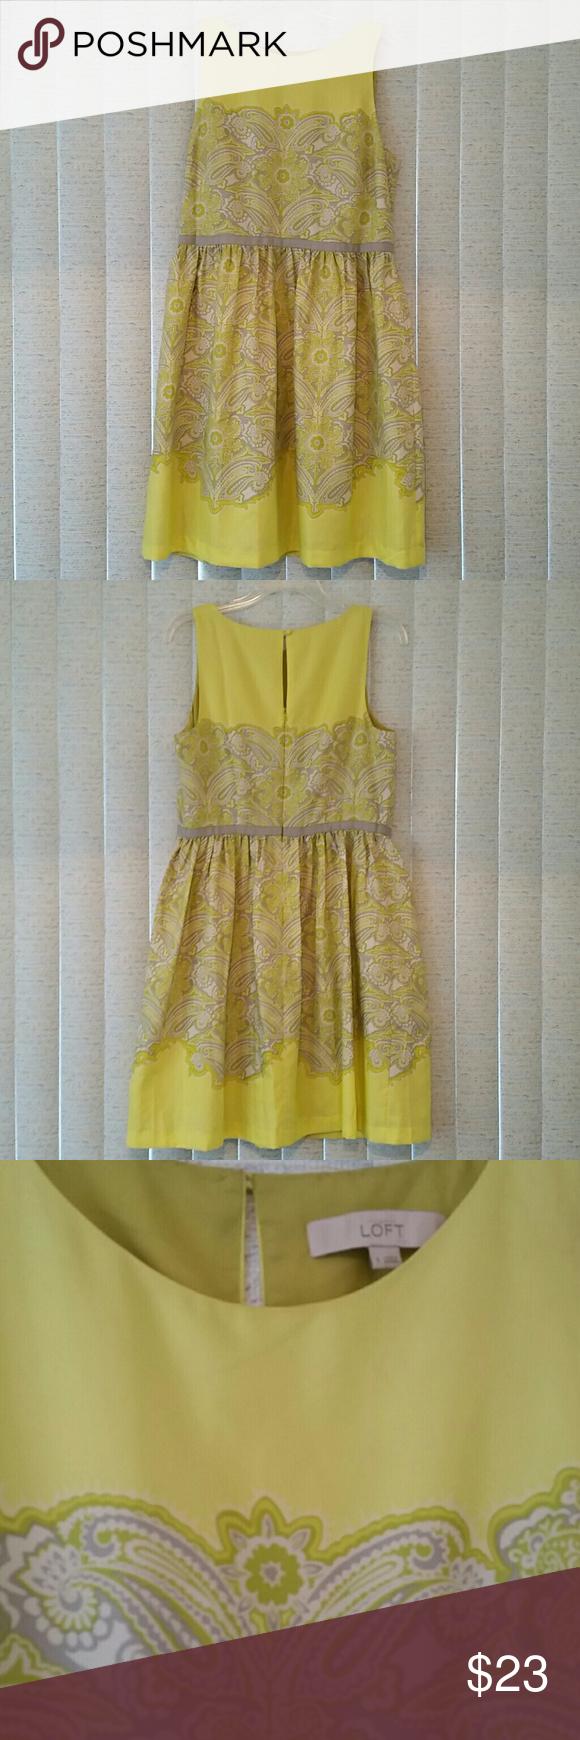 LOFT dress (NWOT) Yellow-Green dress with flower design and built in slip (never worn) (L: 38, Bust: 19) LOFT Dresses